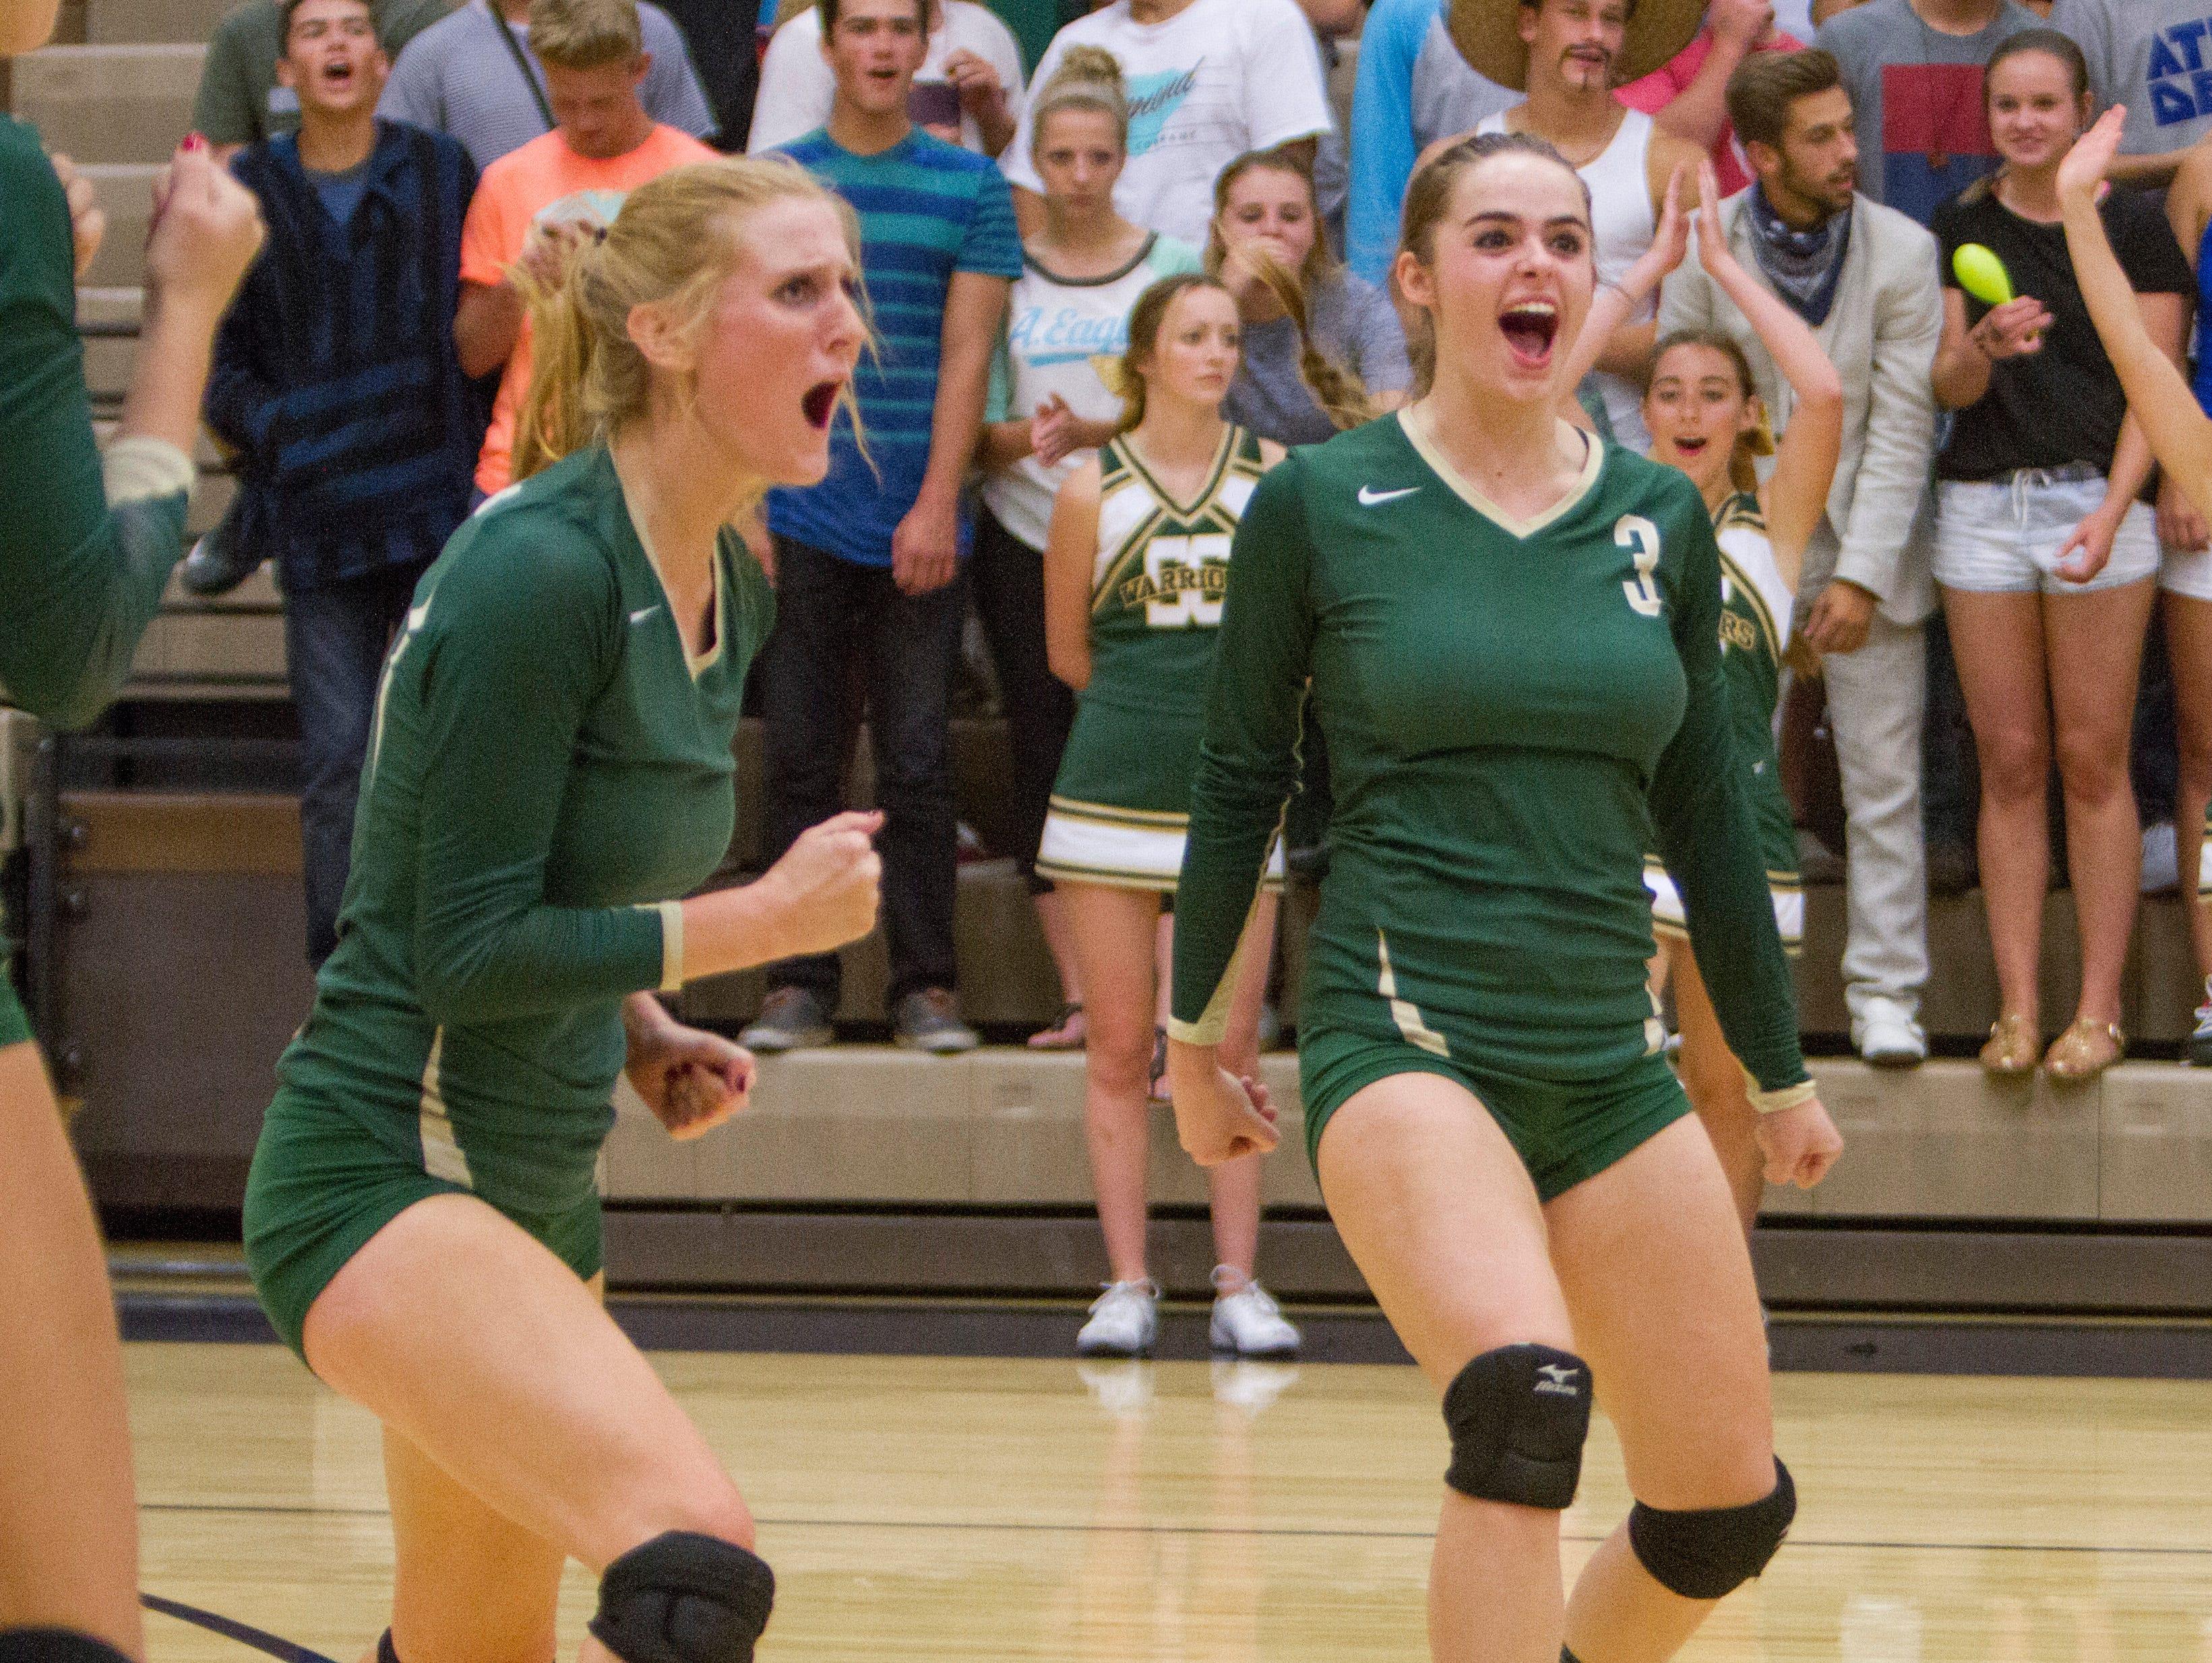 The Snow Canyon girls celebrate after scoring against Desert Hils Thursday, Sept. 24, 2015.